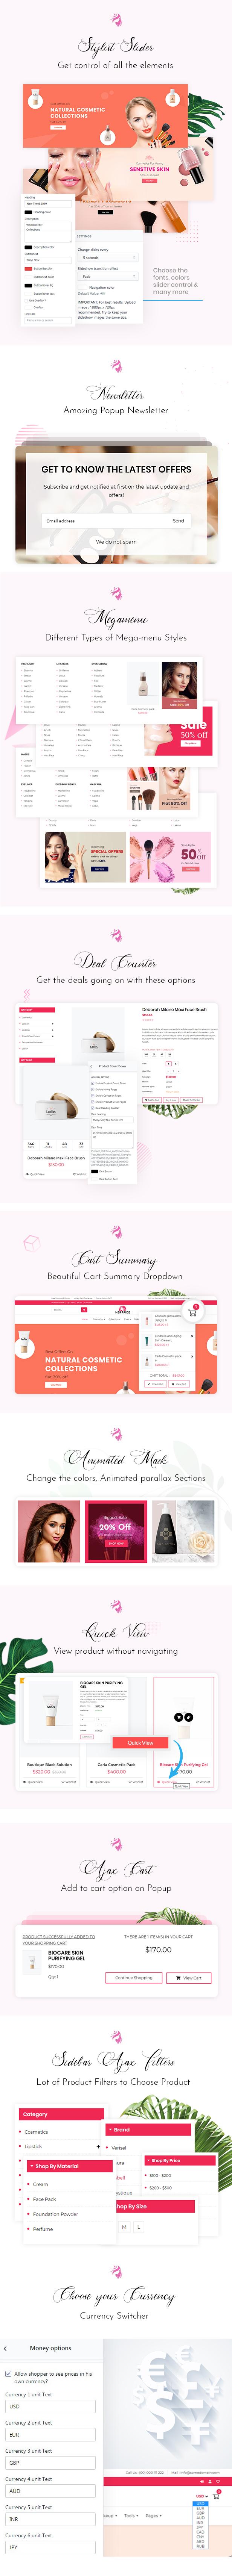 HerPride - Beauty Center, Cosmetic Shop Shopiy Theme - 2